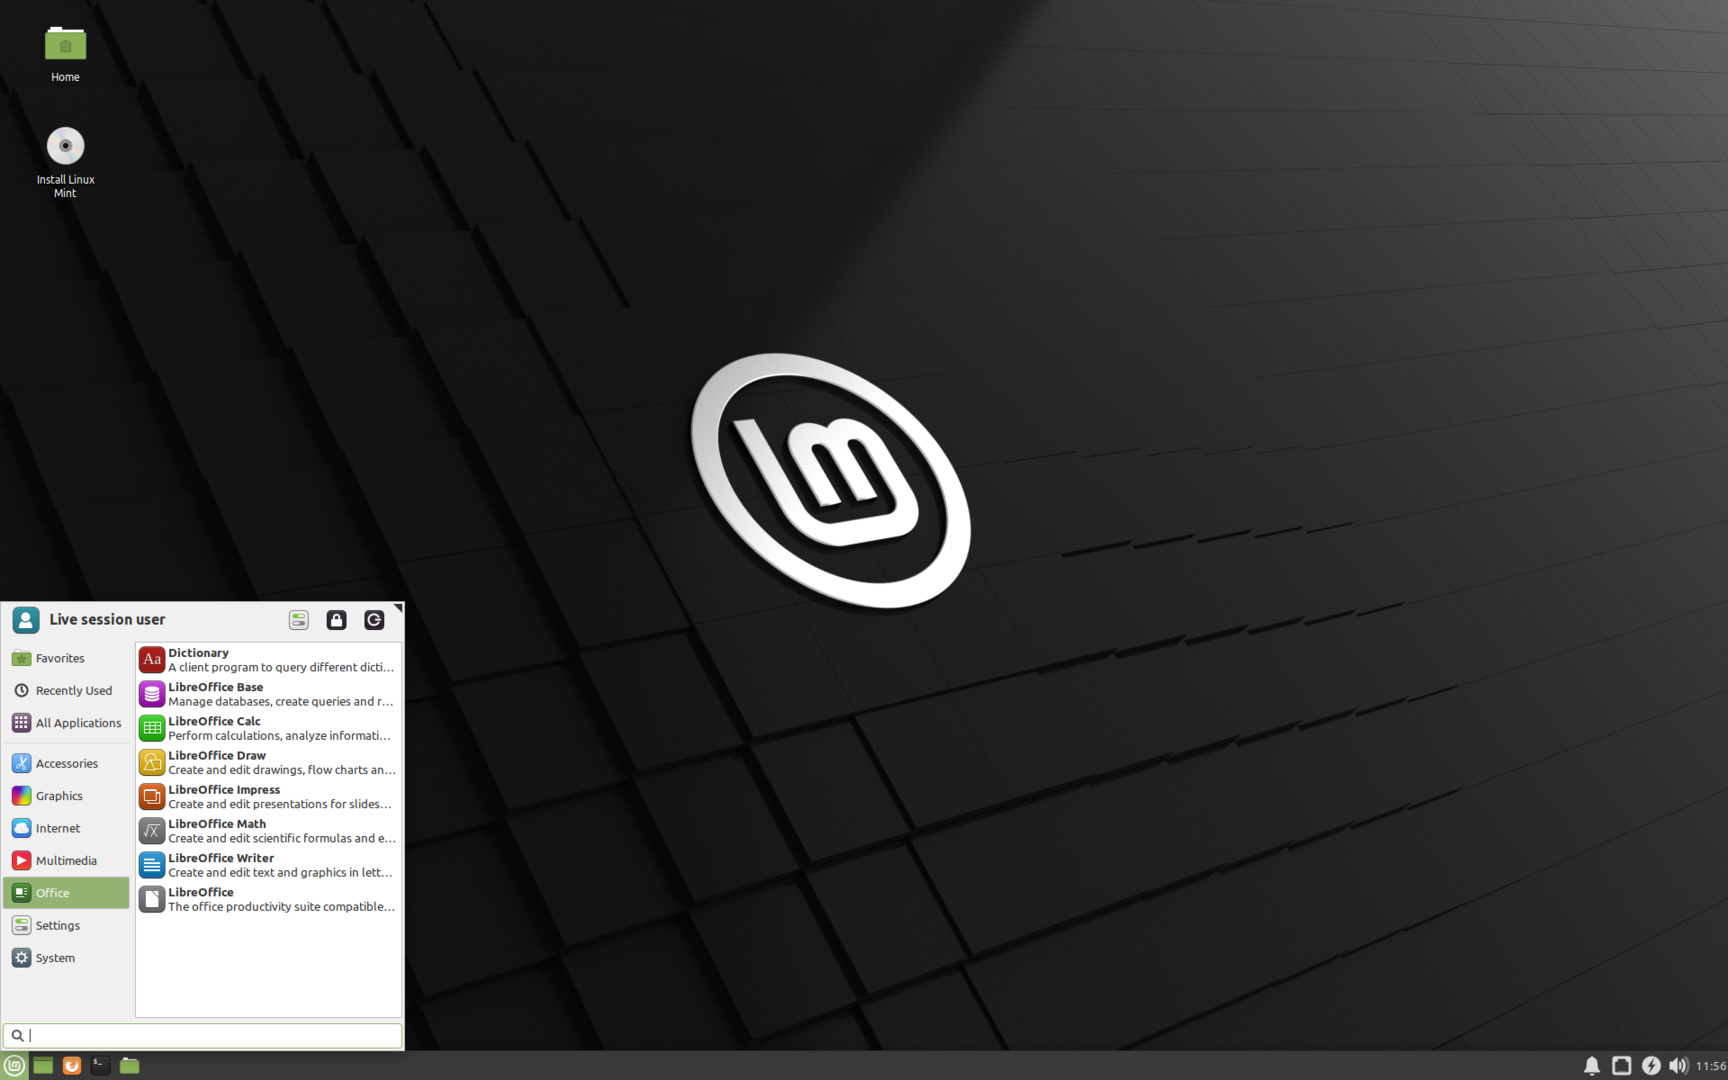 Linux Mint 20 Xfce-Edition